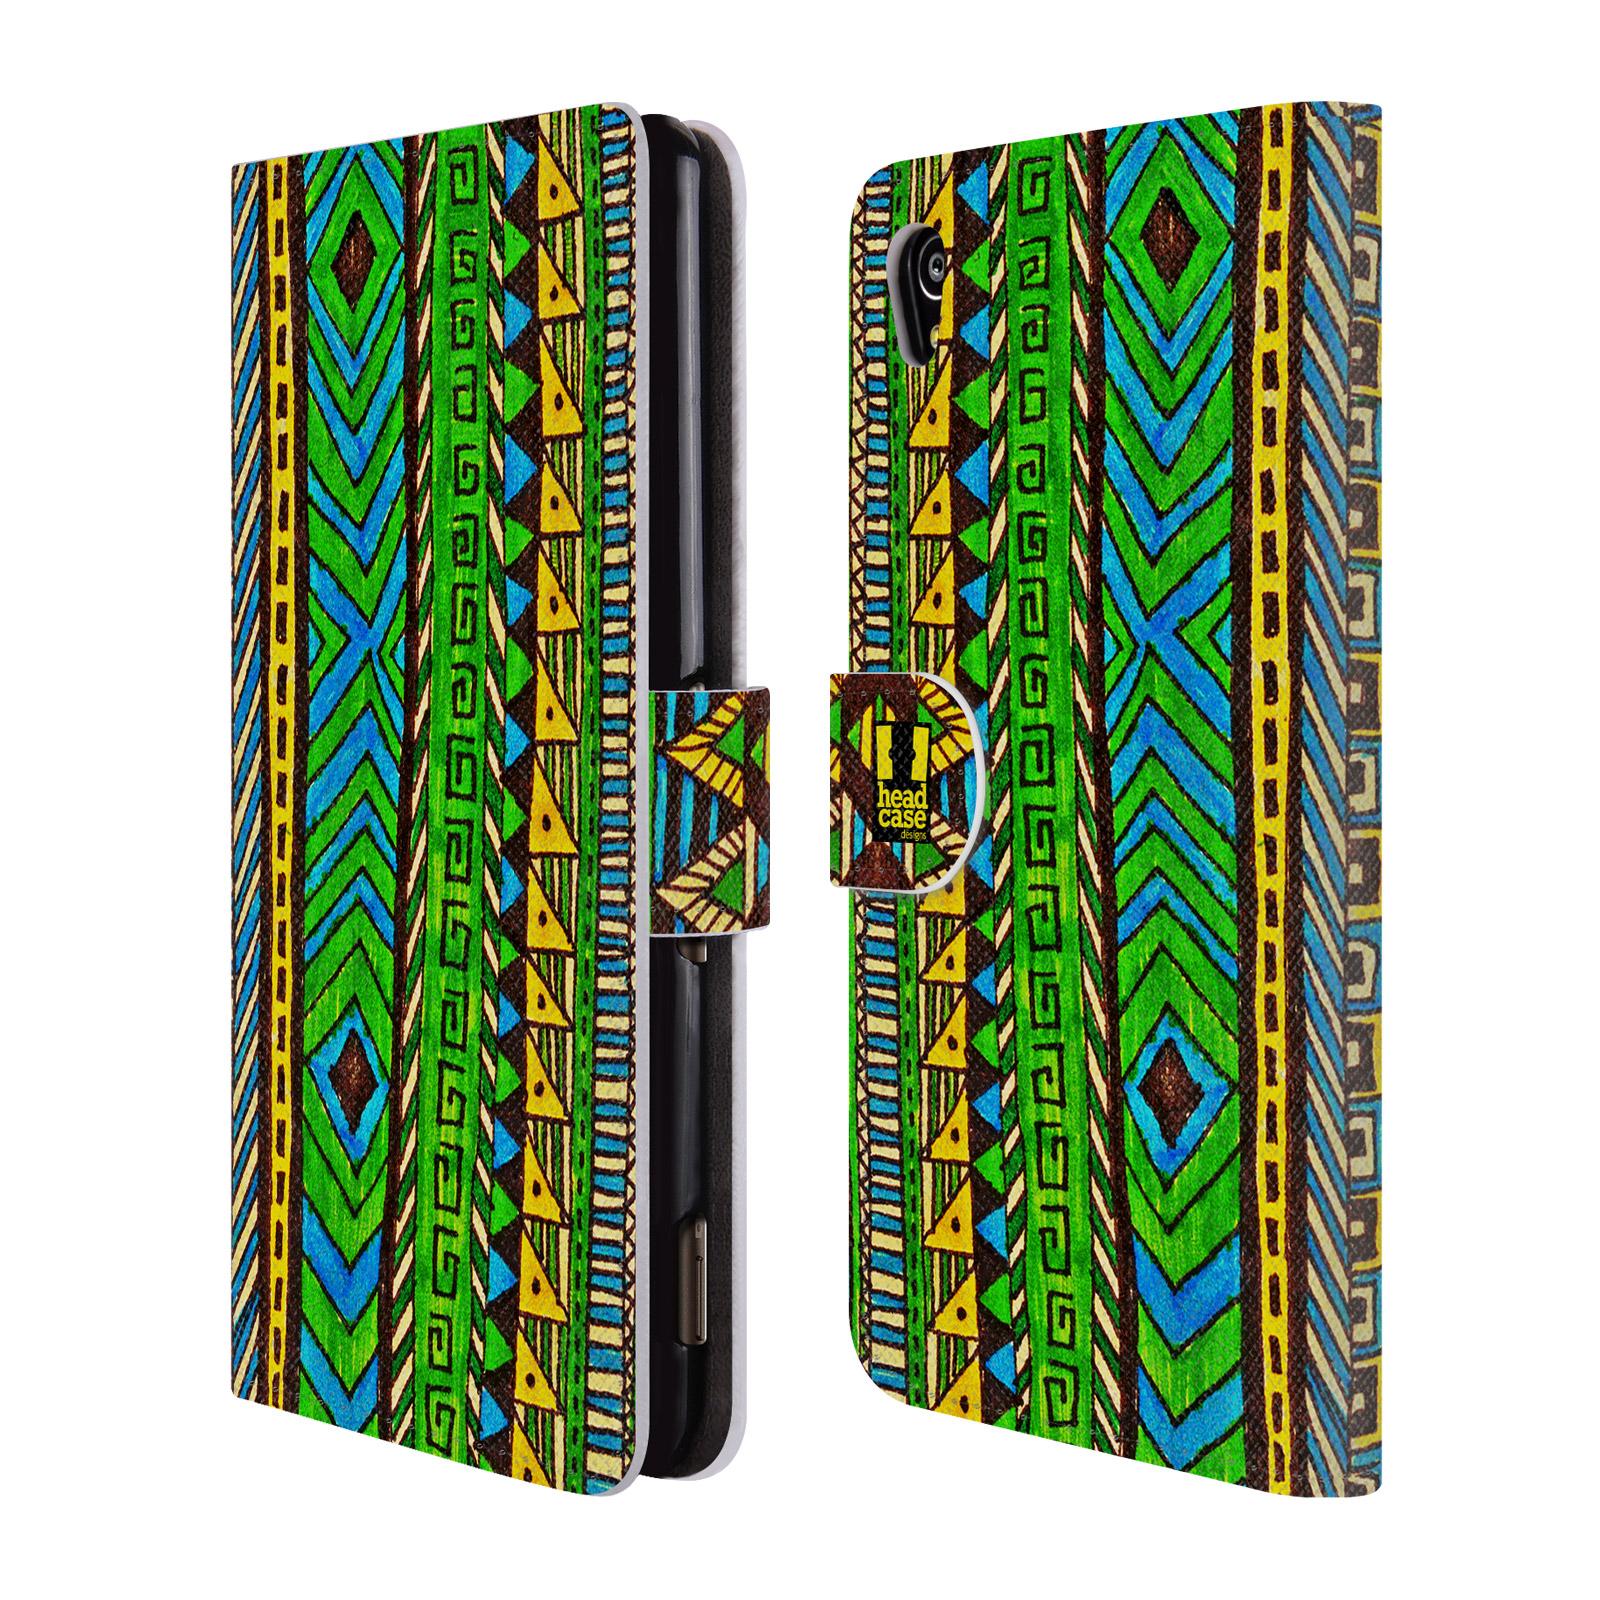 HEAD CASE Flipové pouzdro pro mobil SONY XPERIA M4 AQUA Barevná aztécká čmáranice zelená